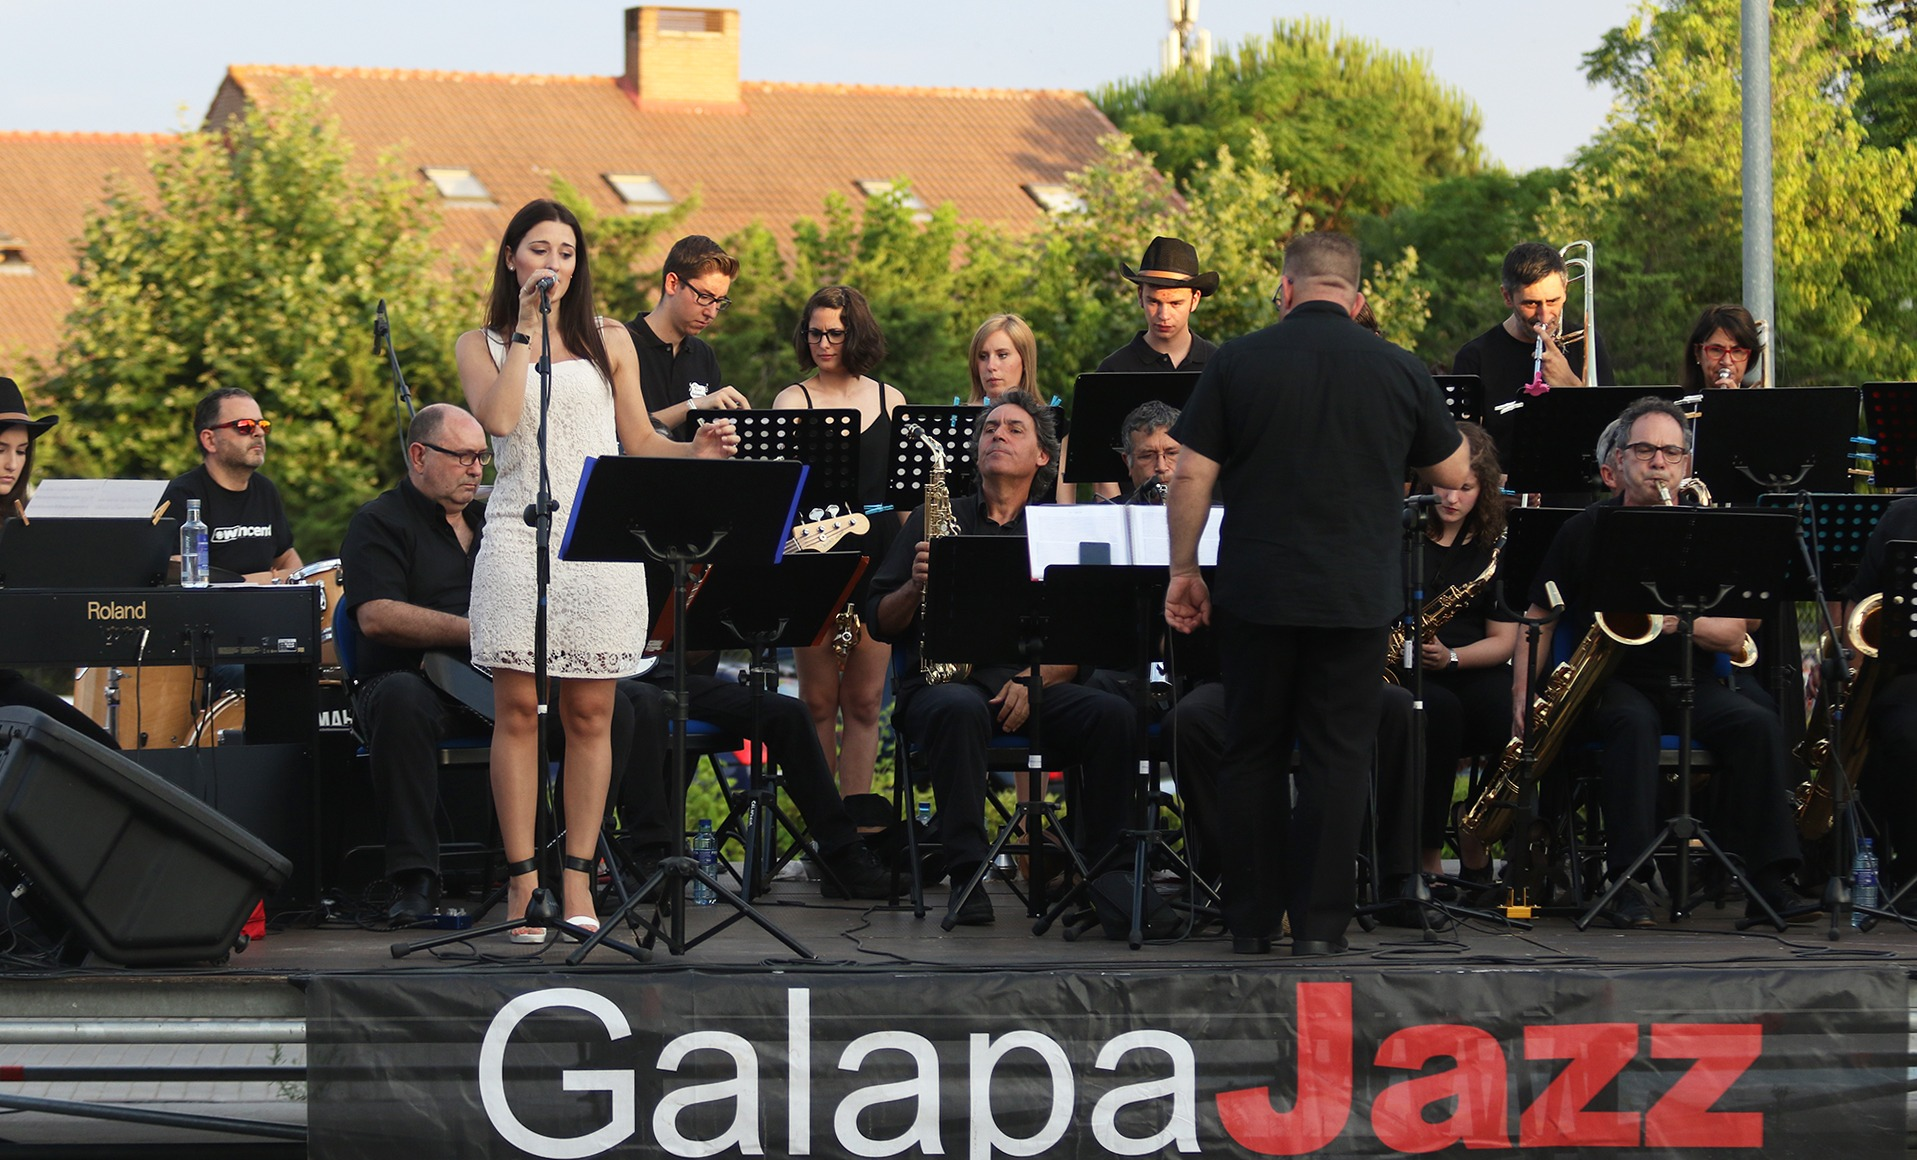 galapajazz vierners (4)